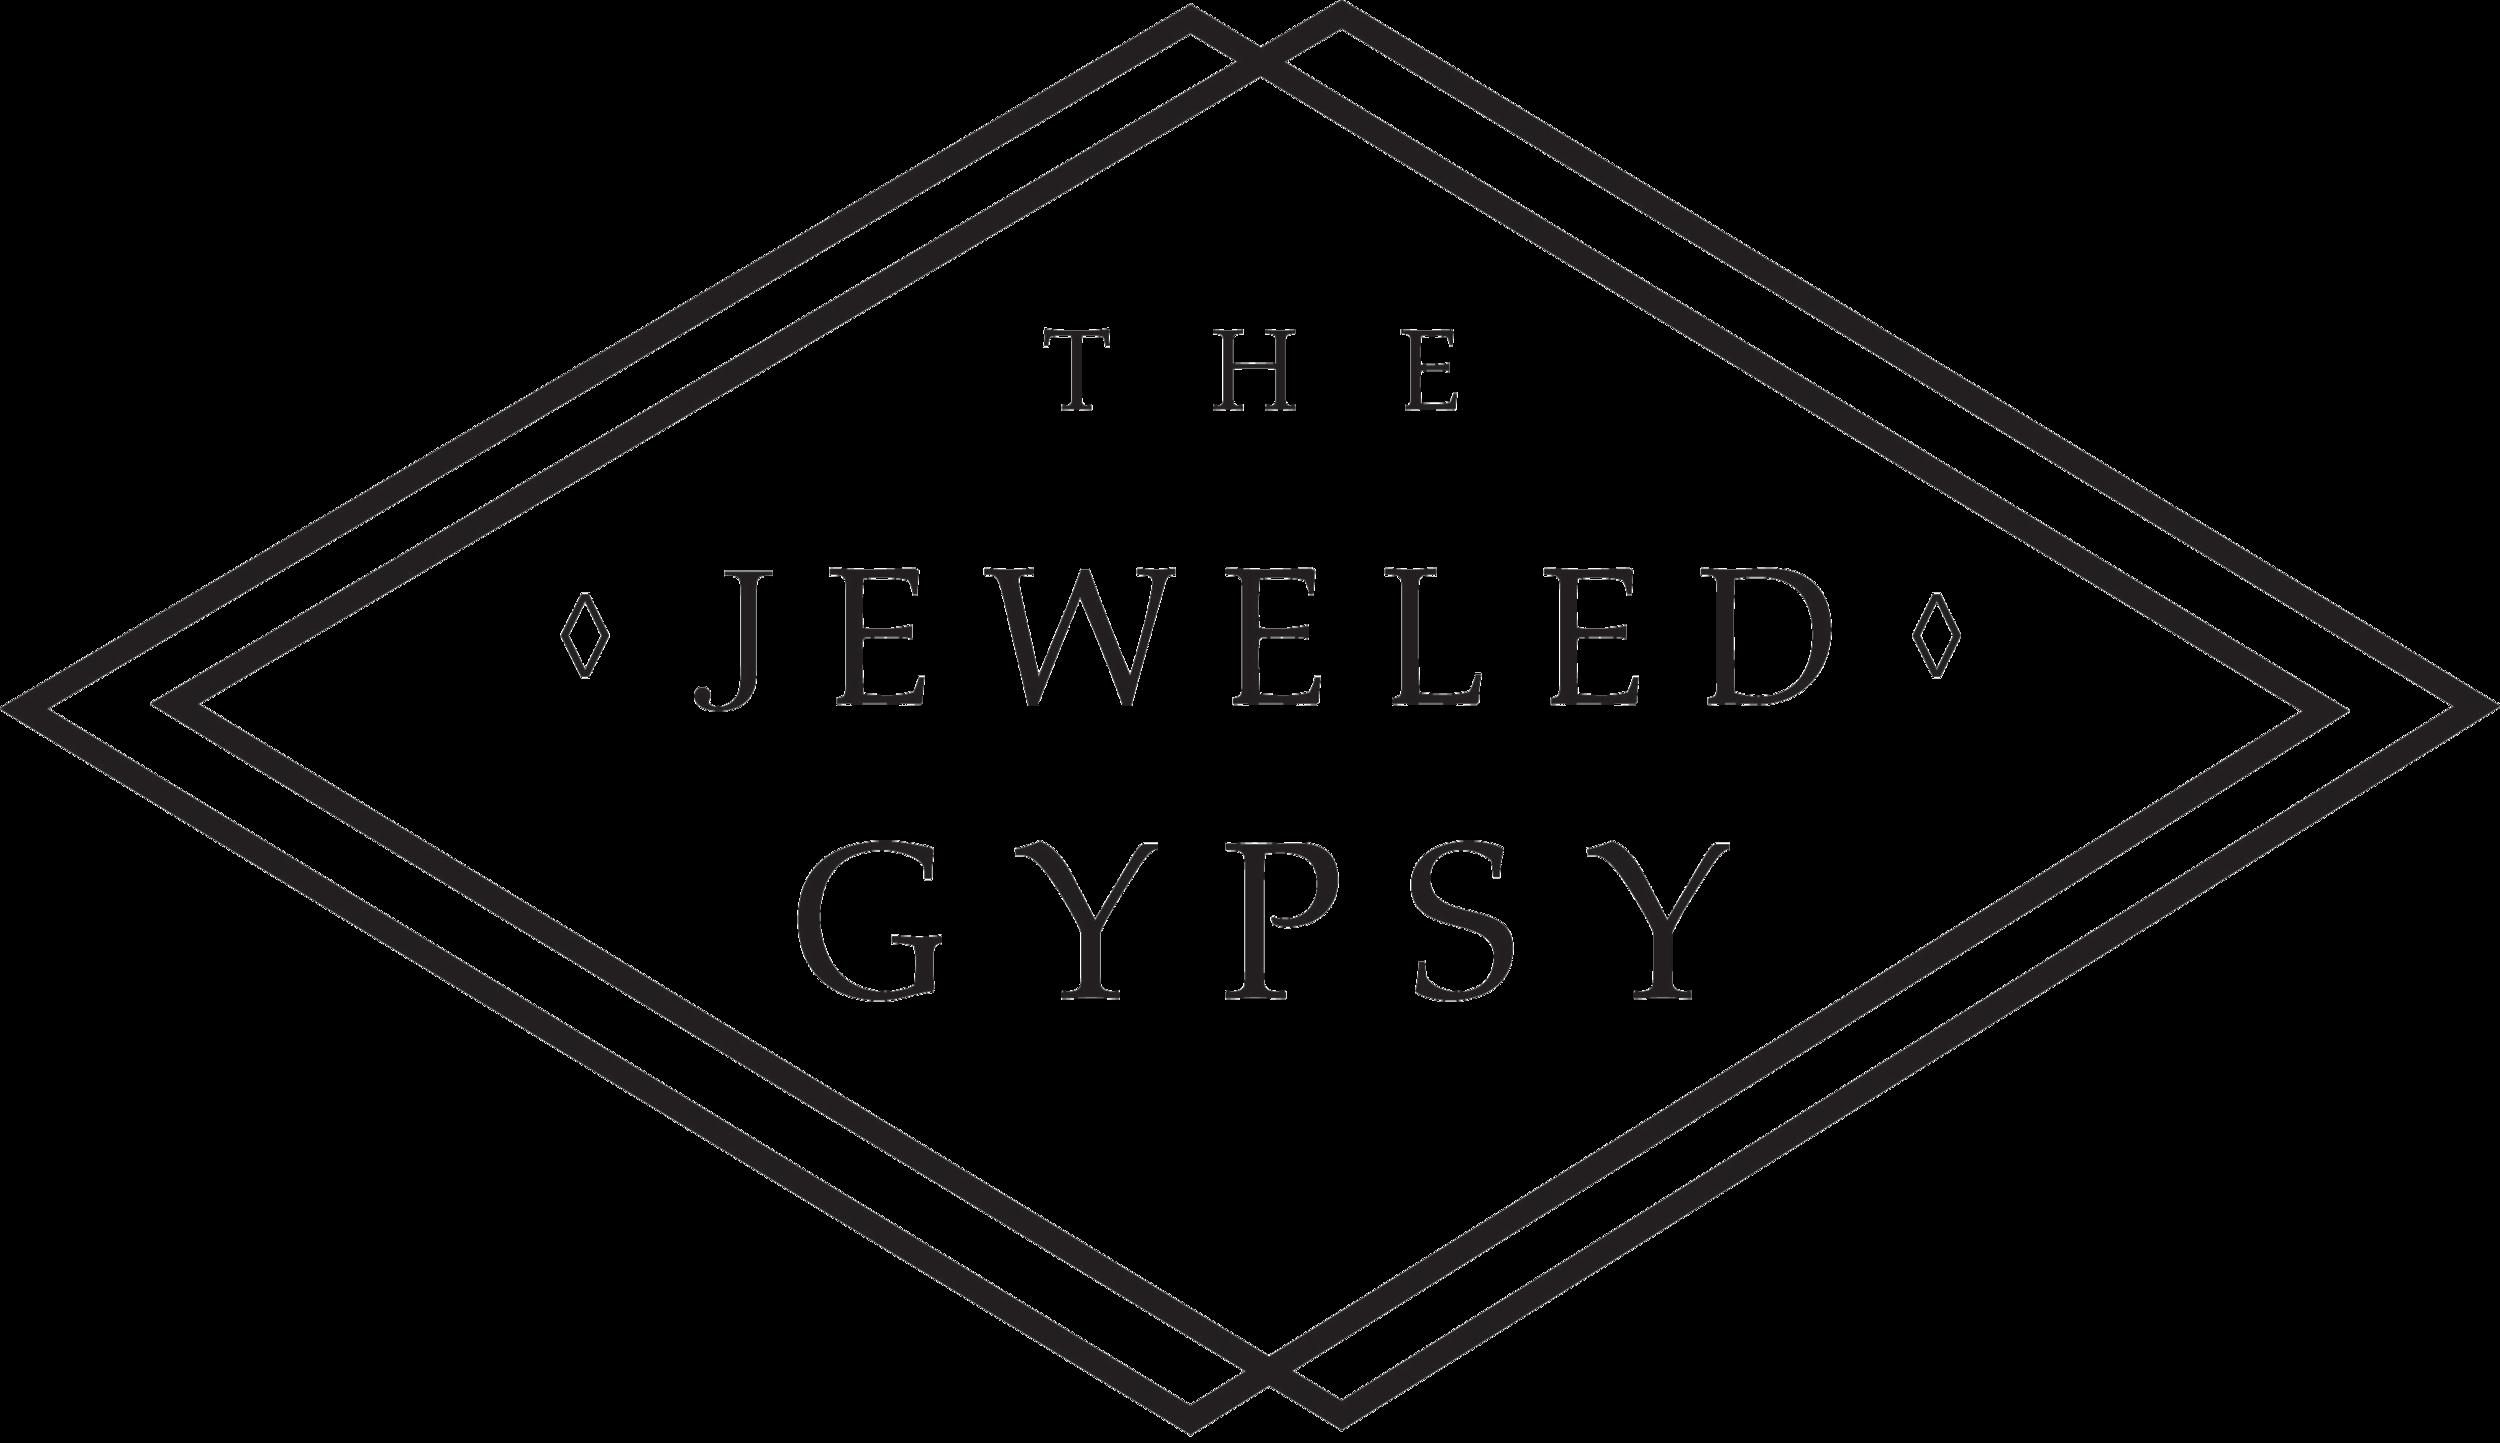 jeweledgypsy